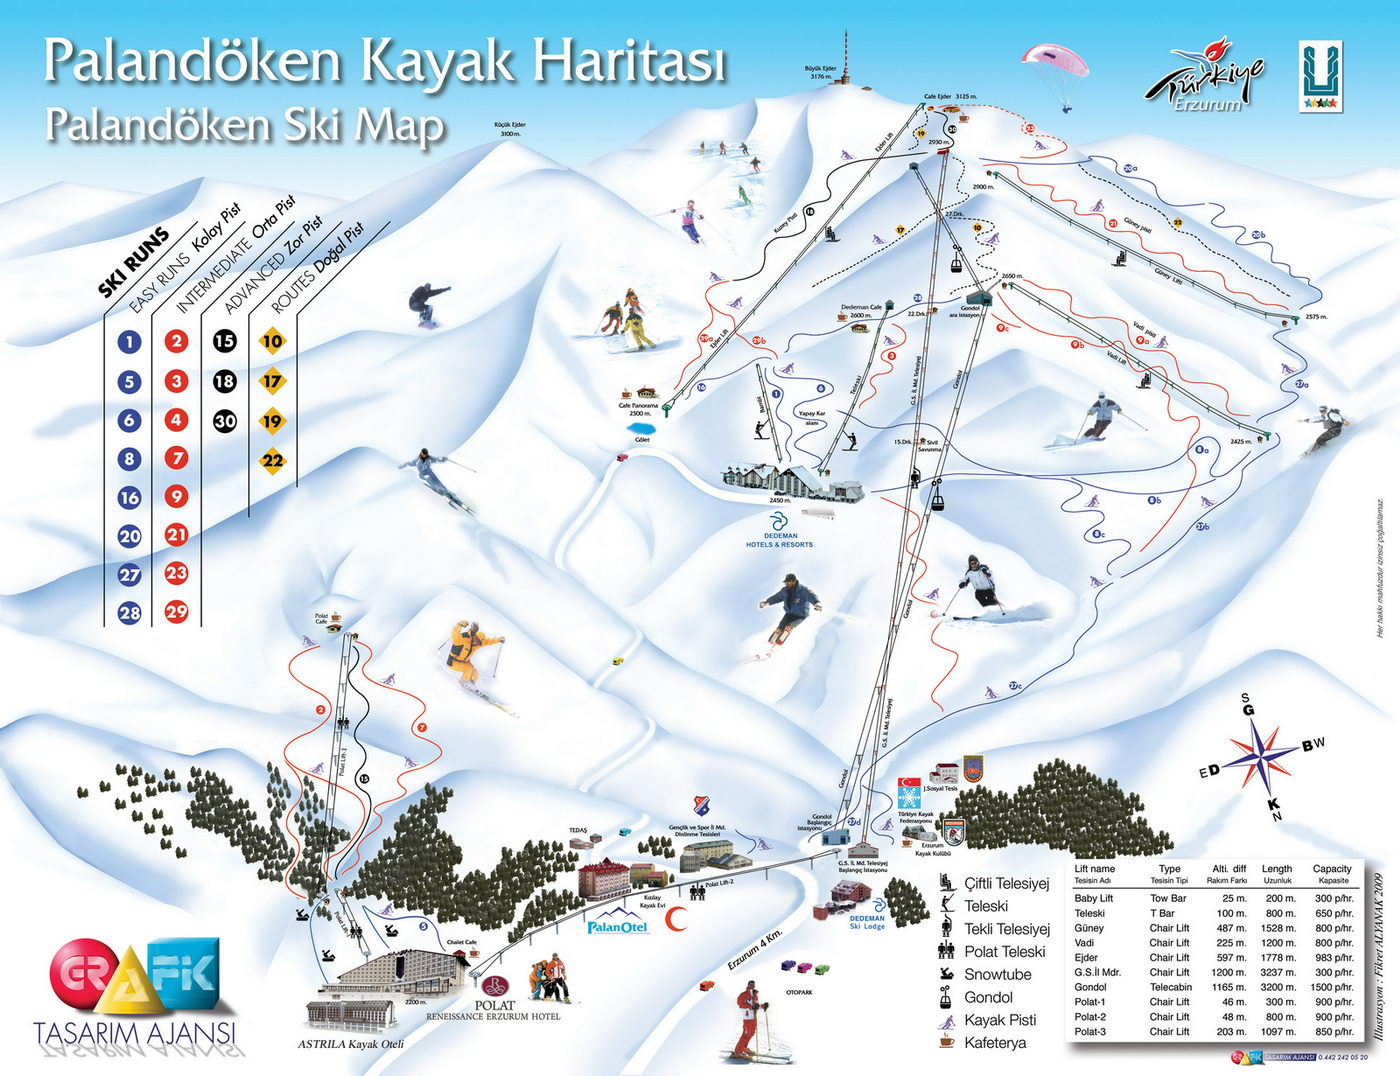 Схема трасс курорта Паландокен